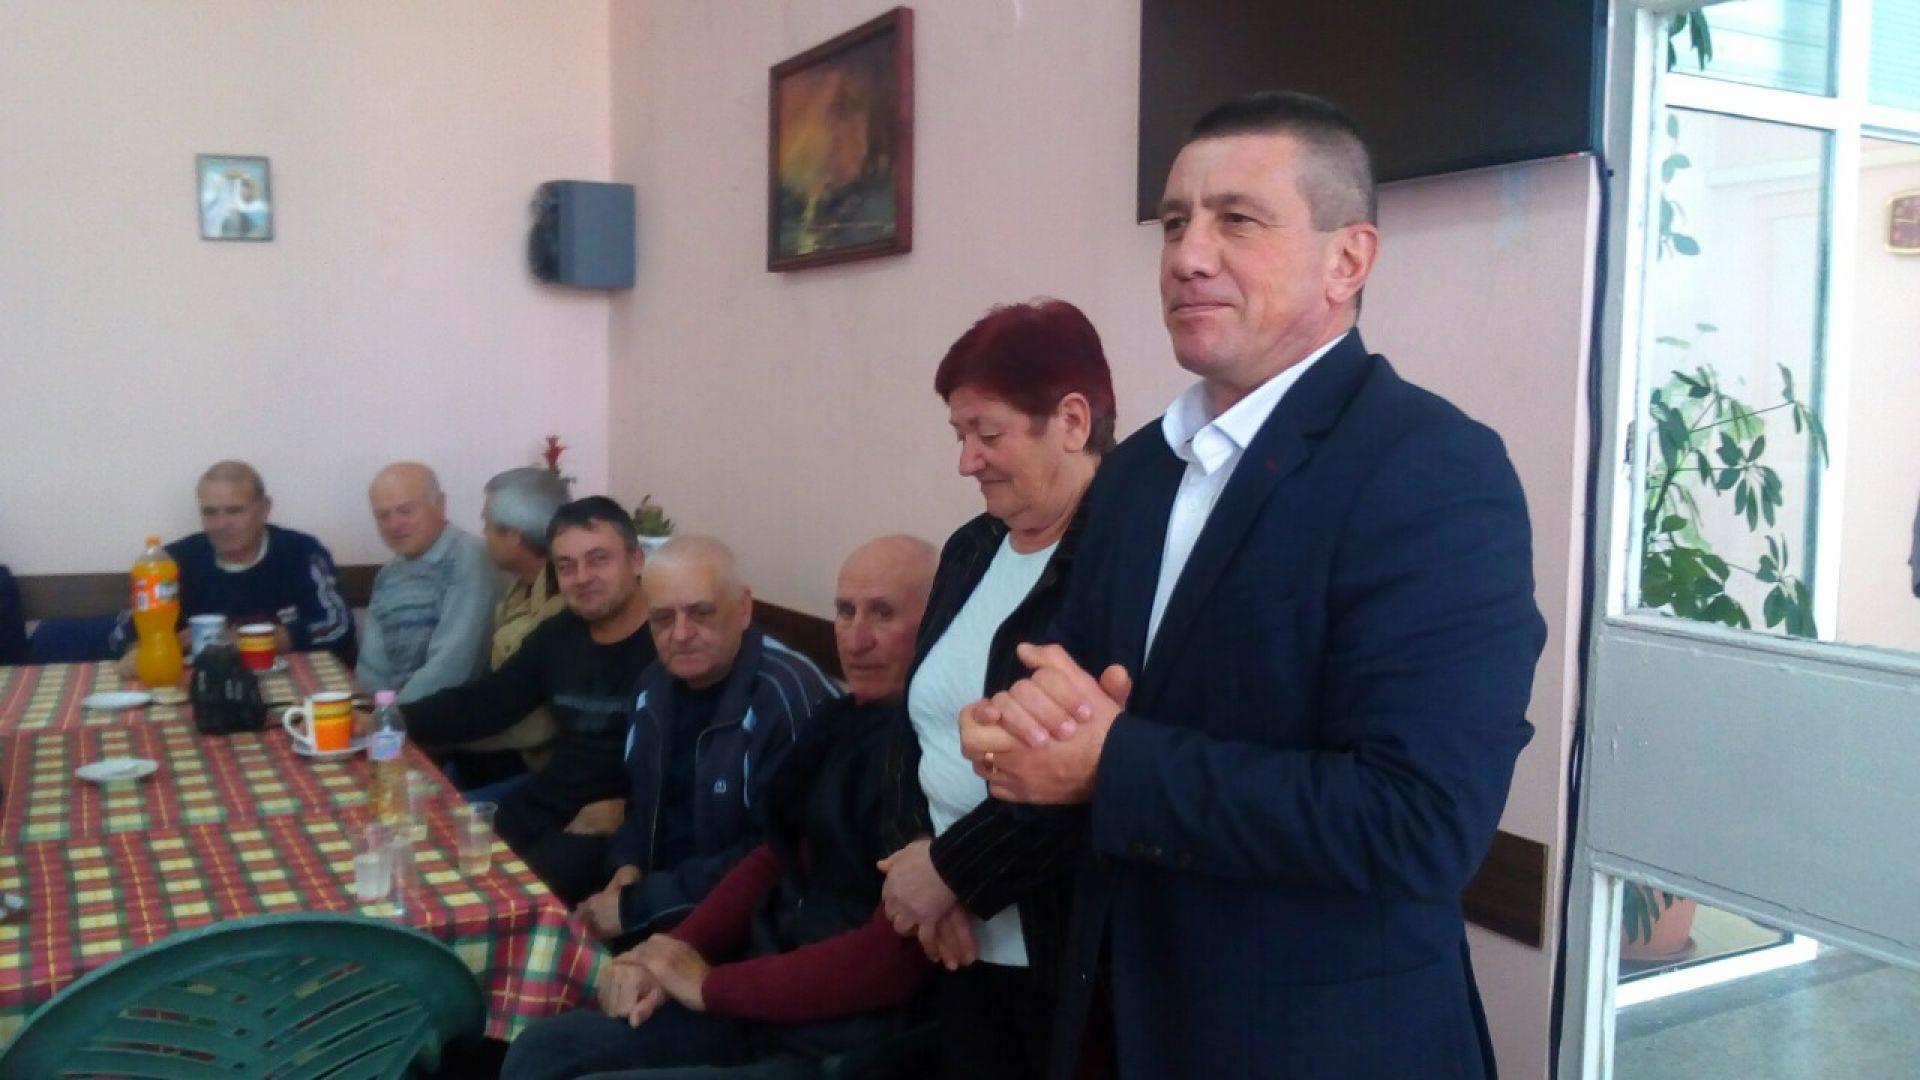 Пенсионерският клуб към пристанище Бургас празнува Бабин ден - 23.01.2019